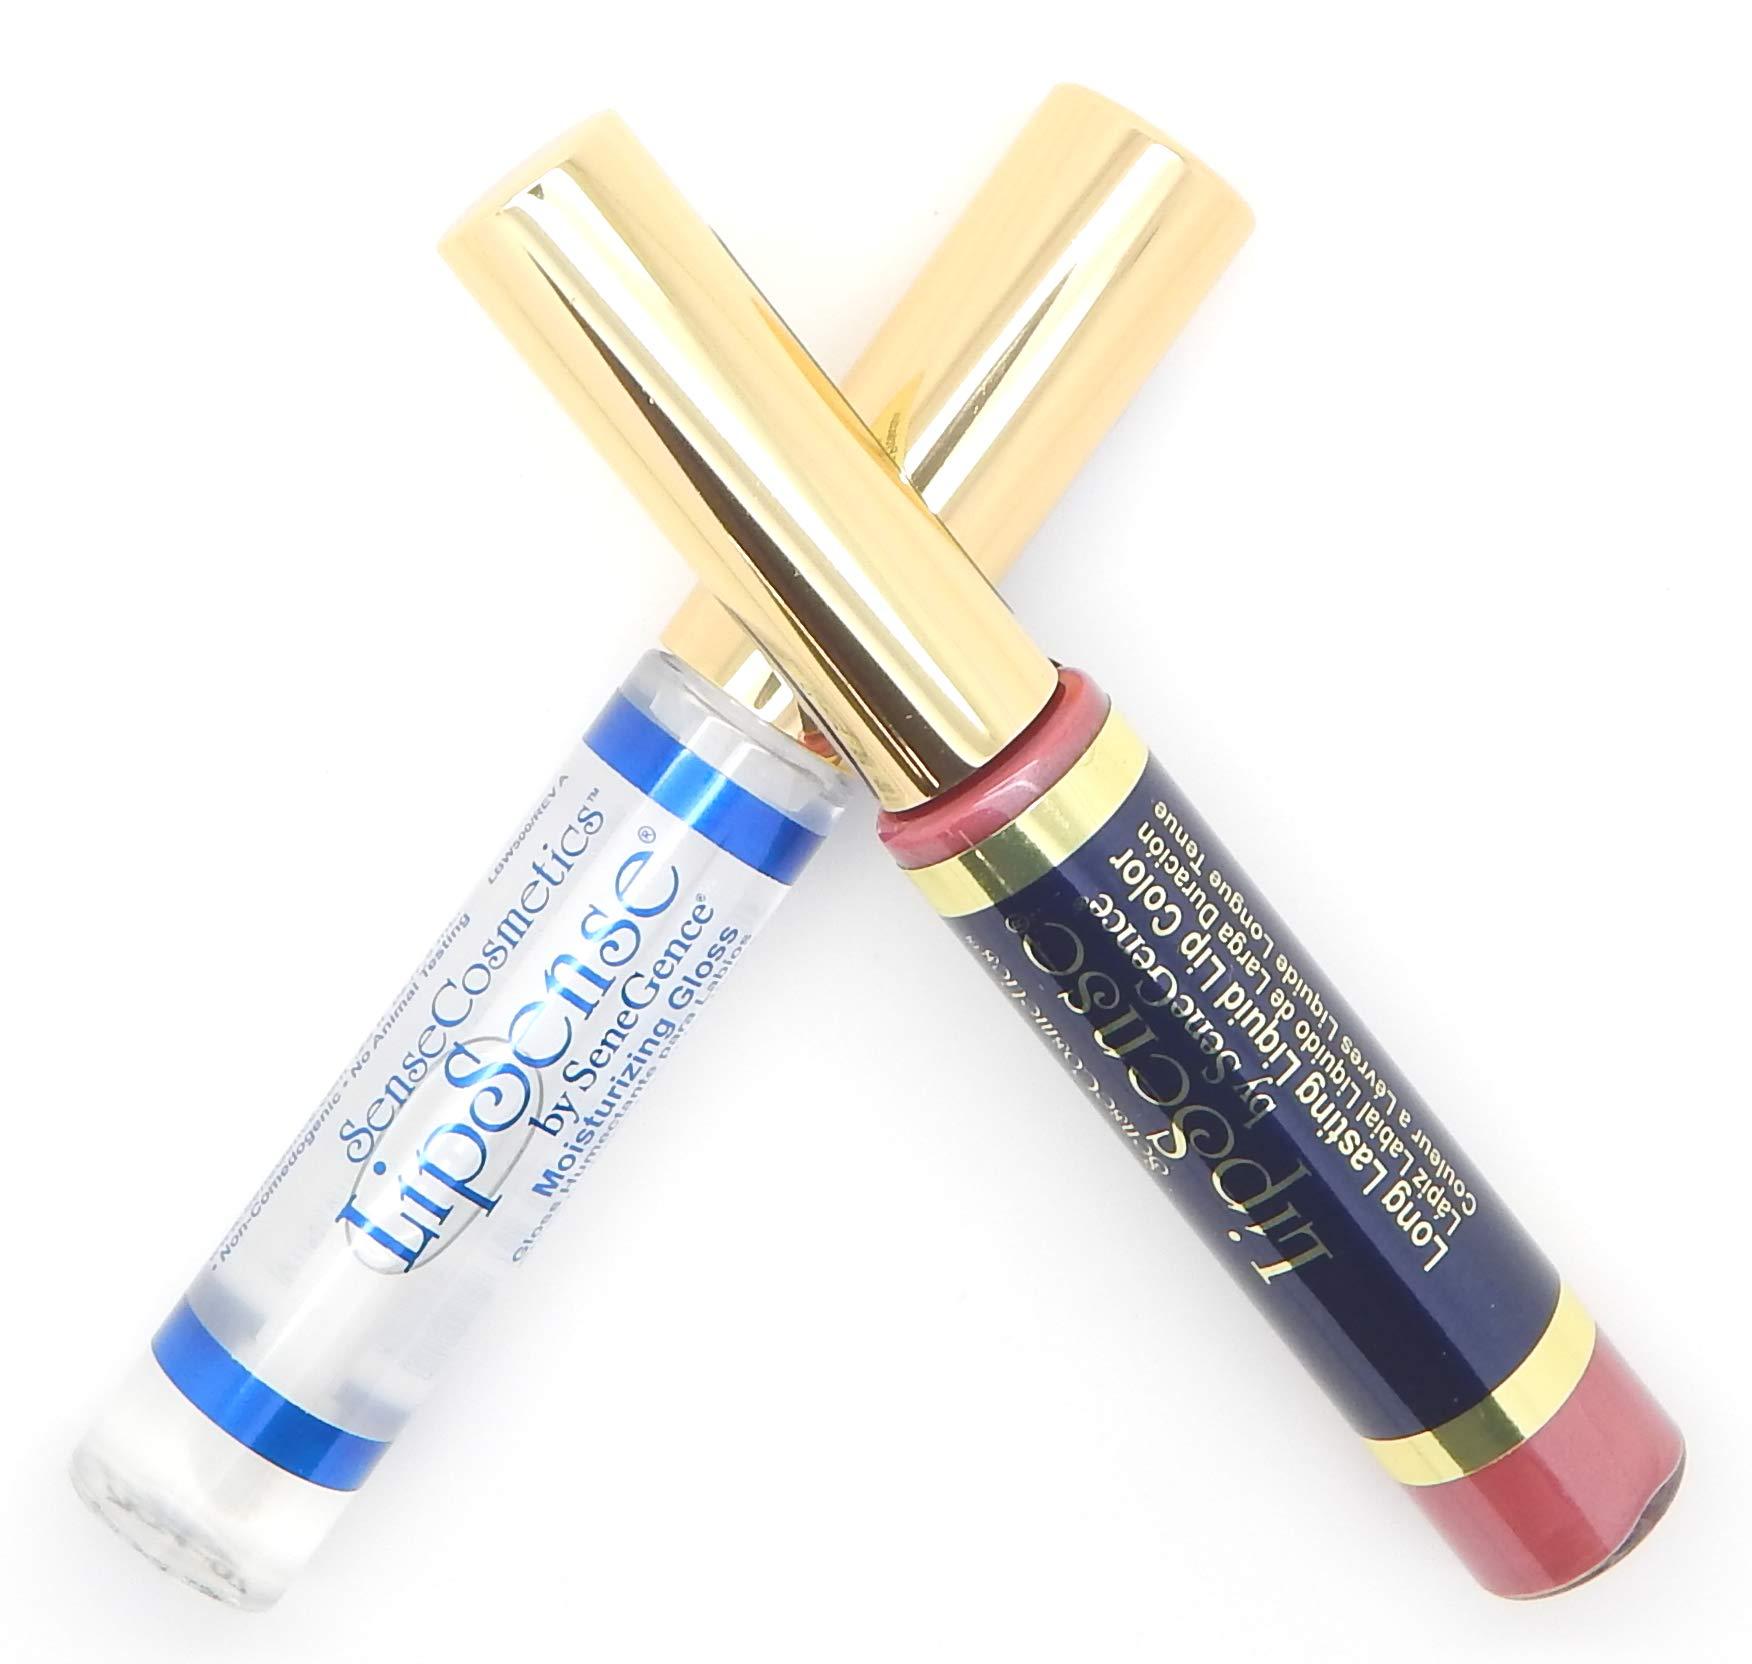 LipSense Bundle - 1 Color and 1 Glossy Gloss - CARAMEL APPLE by LipSense